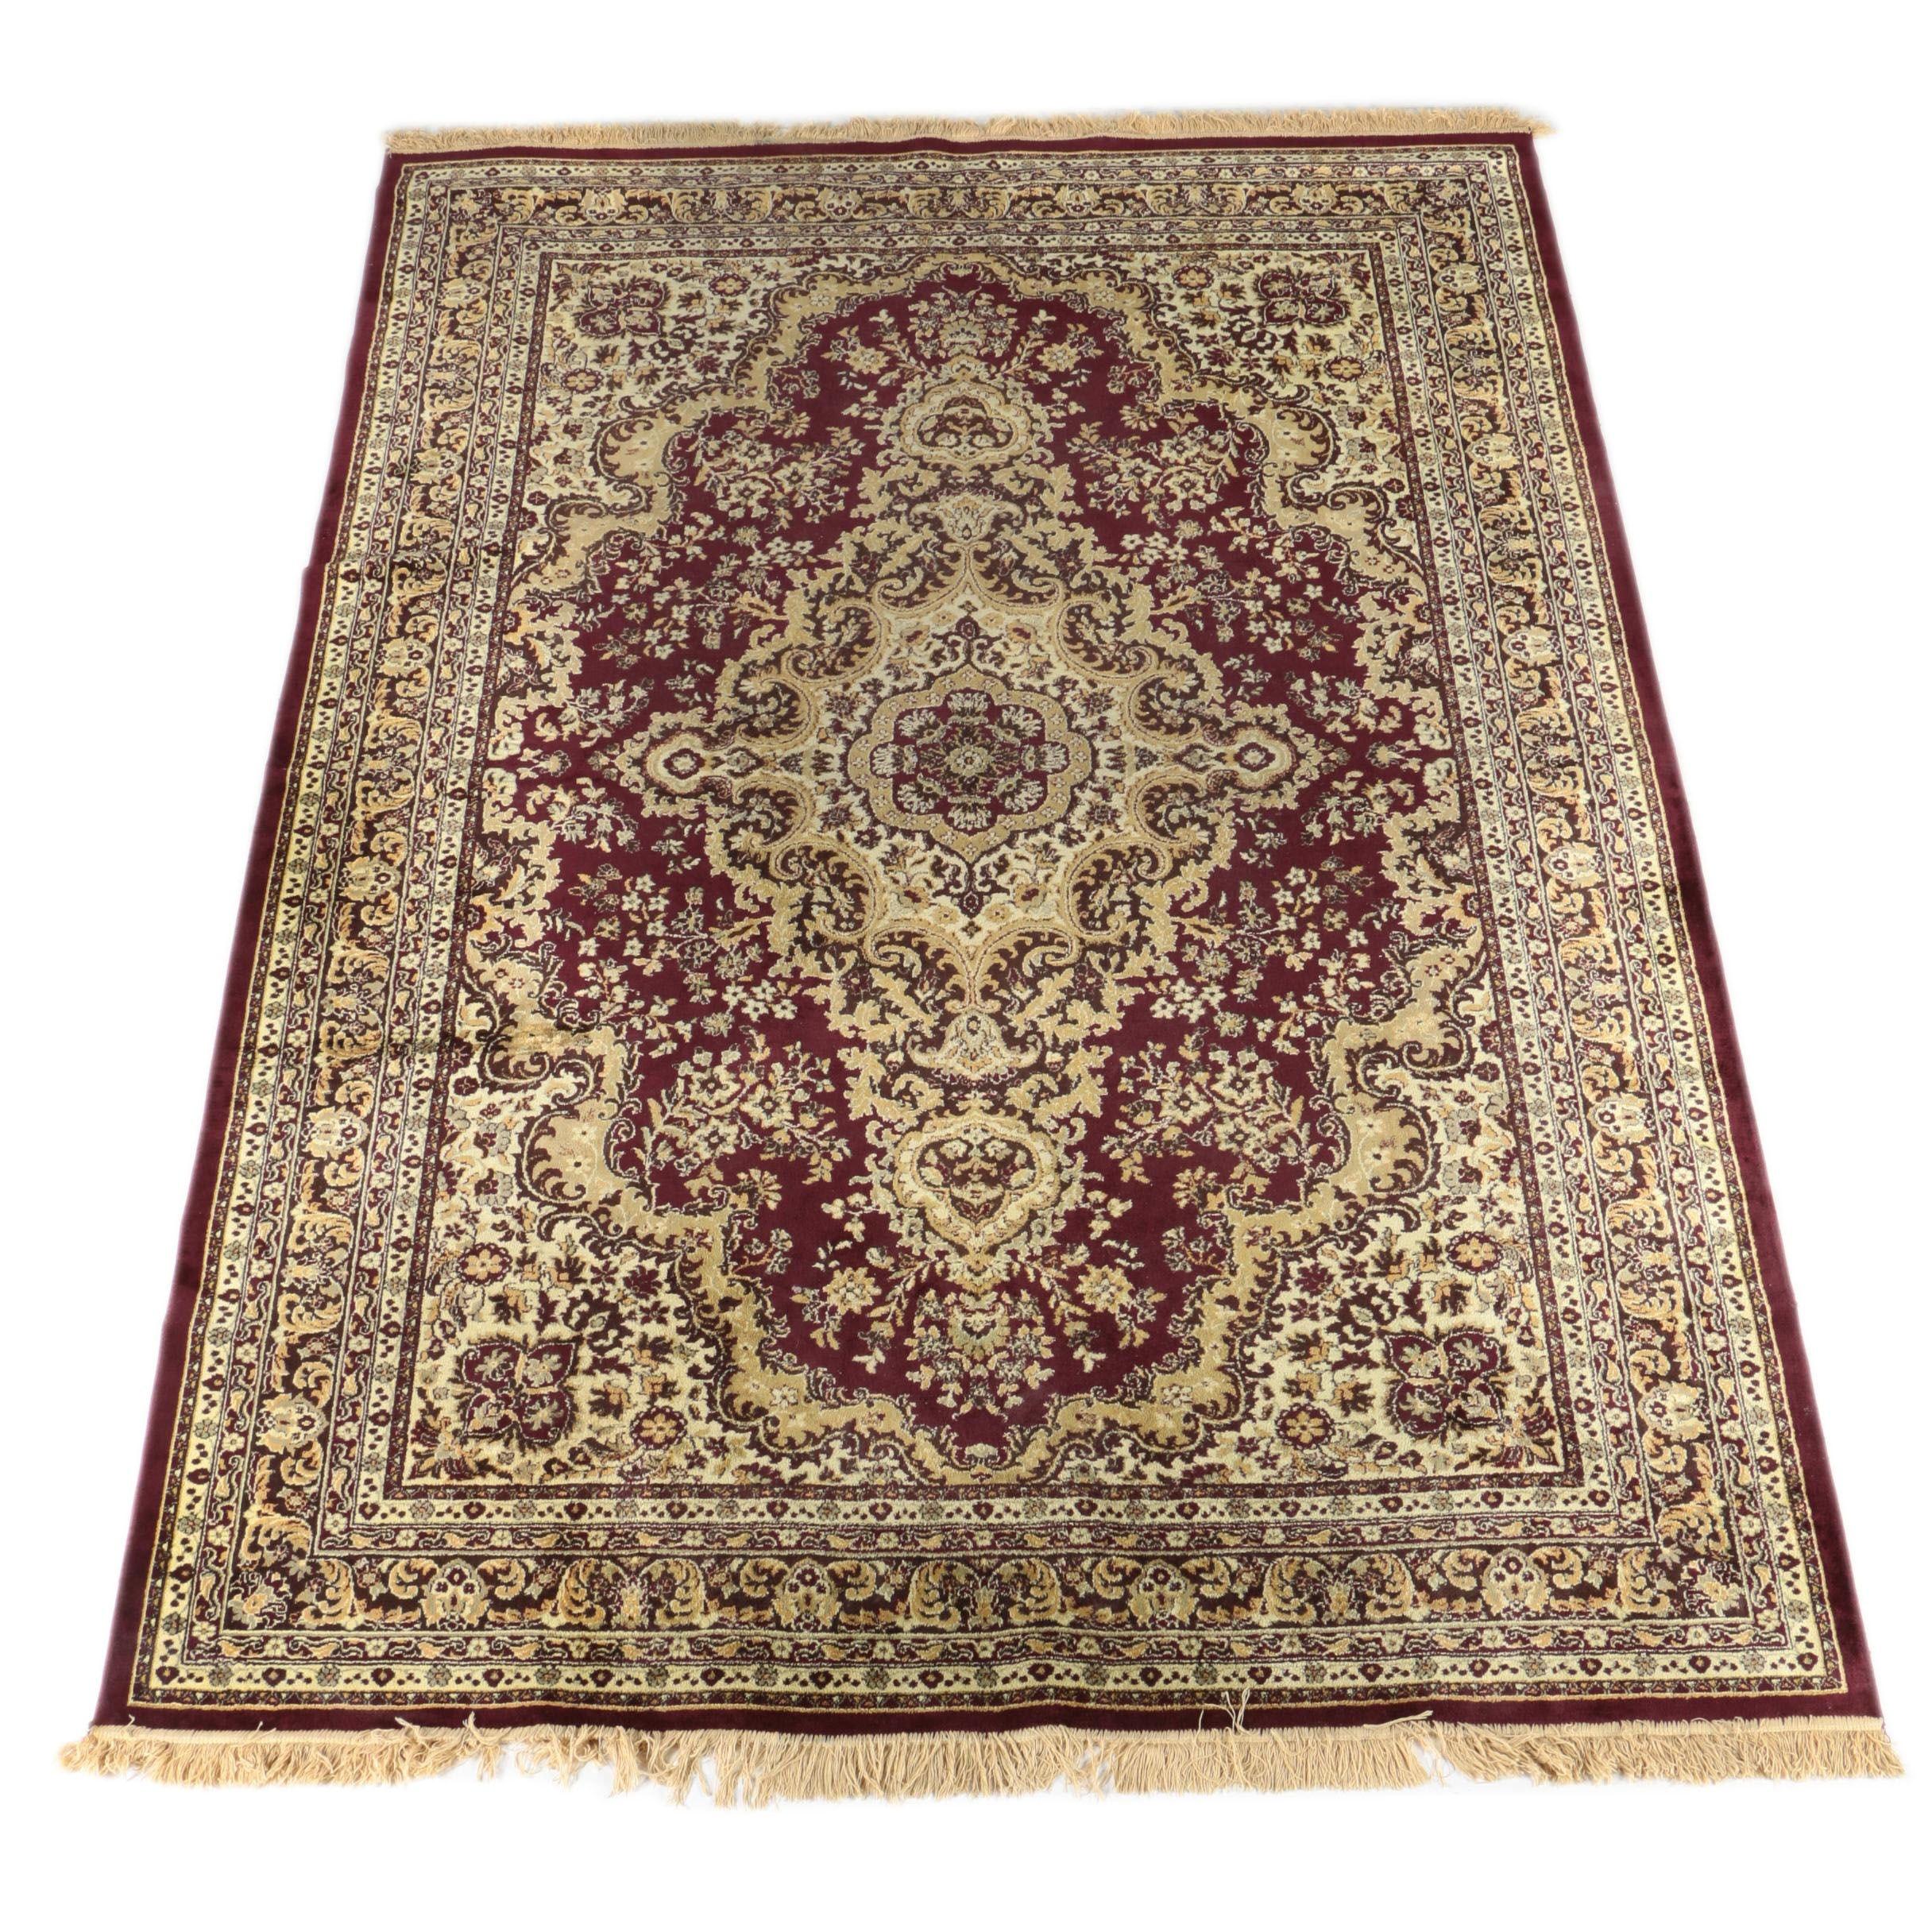 Machine Made Persian Style Area Rug